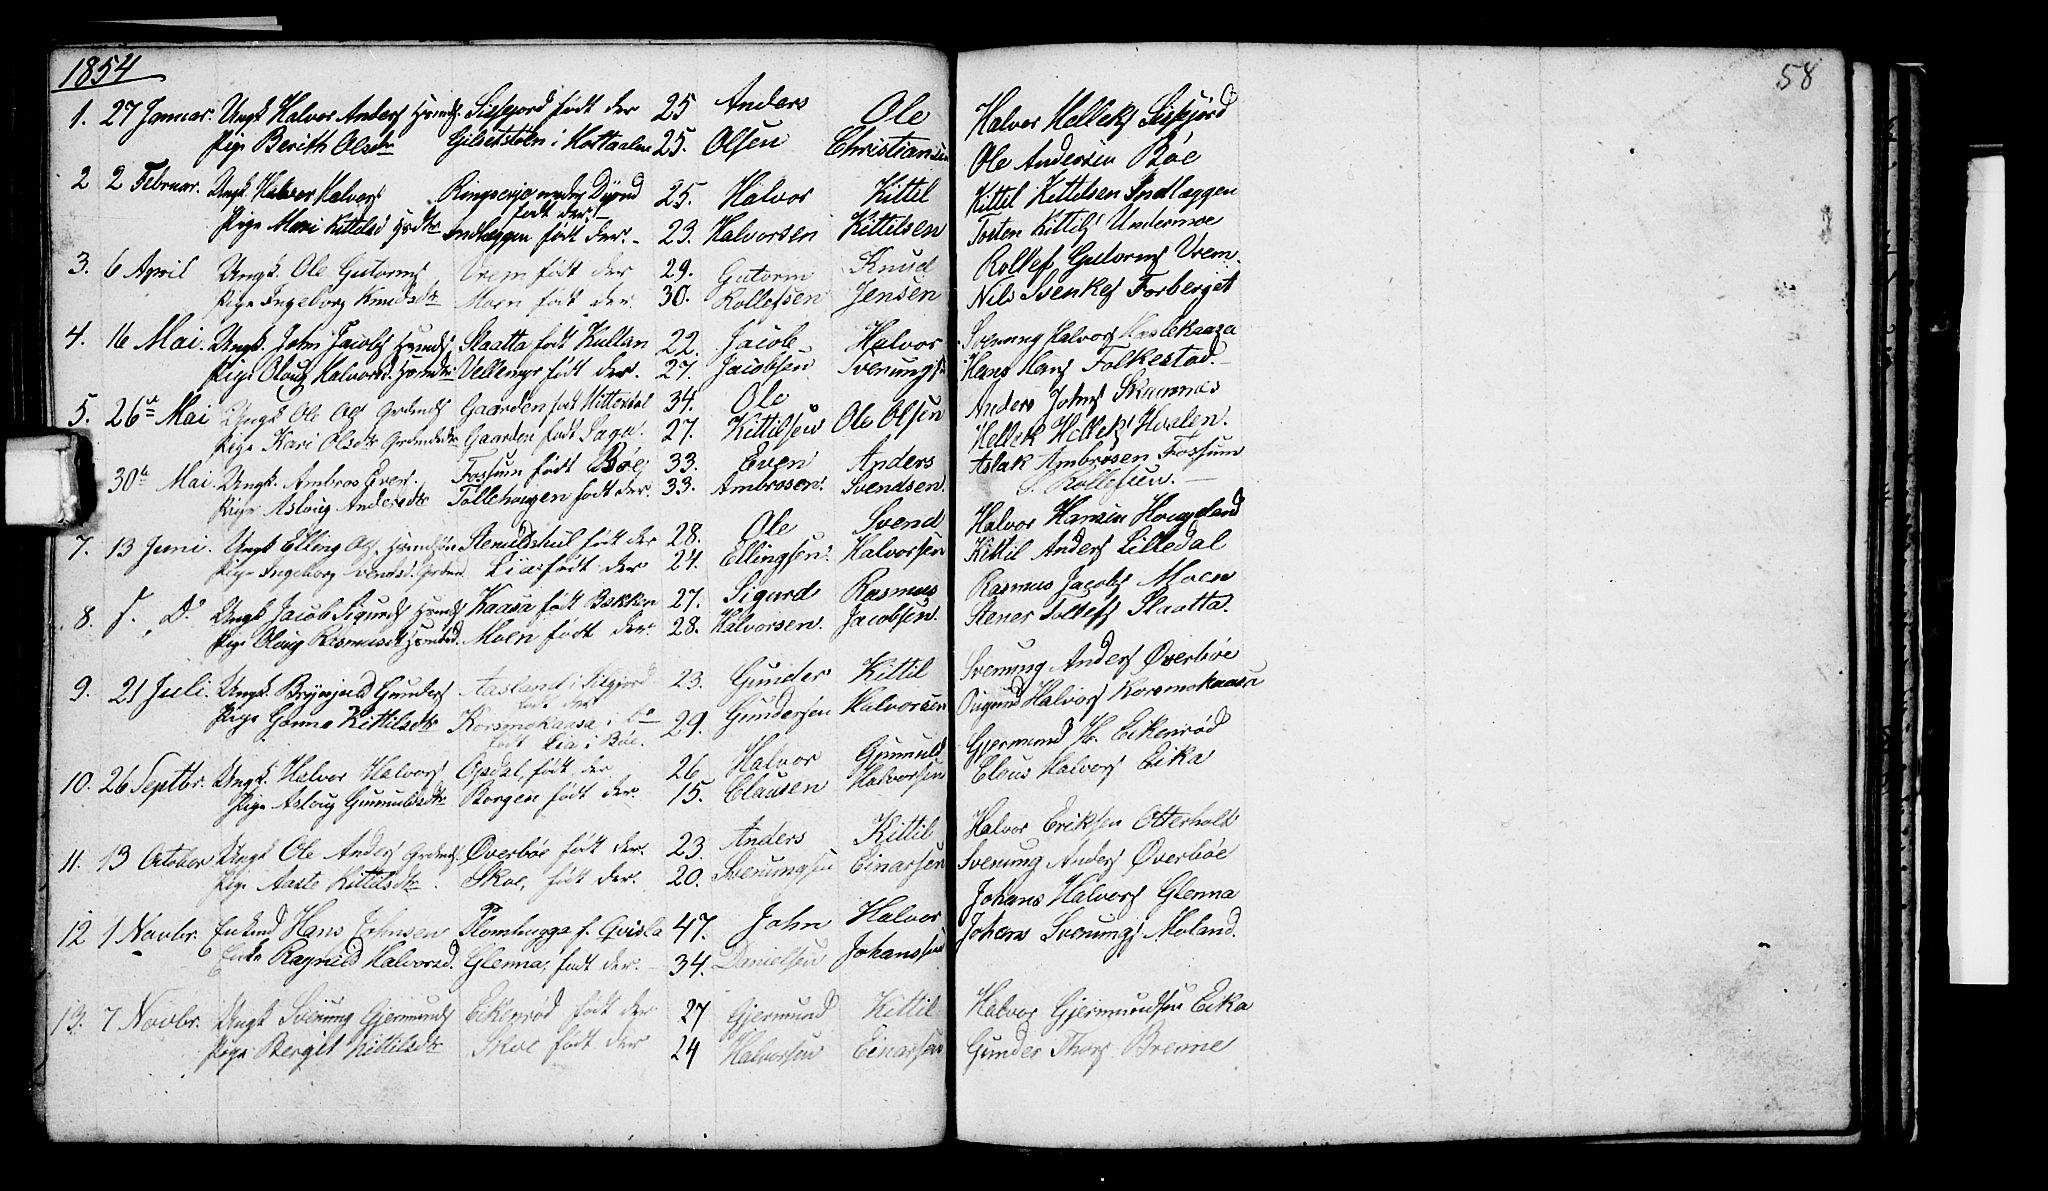 SAKO, Bø kirkebøker, G/Ga/L0002: Klokkerbok nr. 2, 1853-1866, s. 58